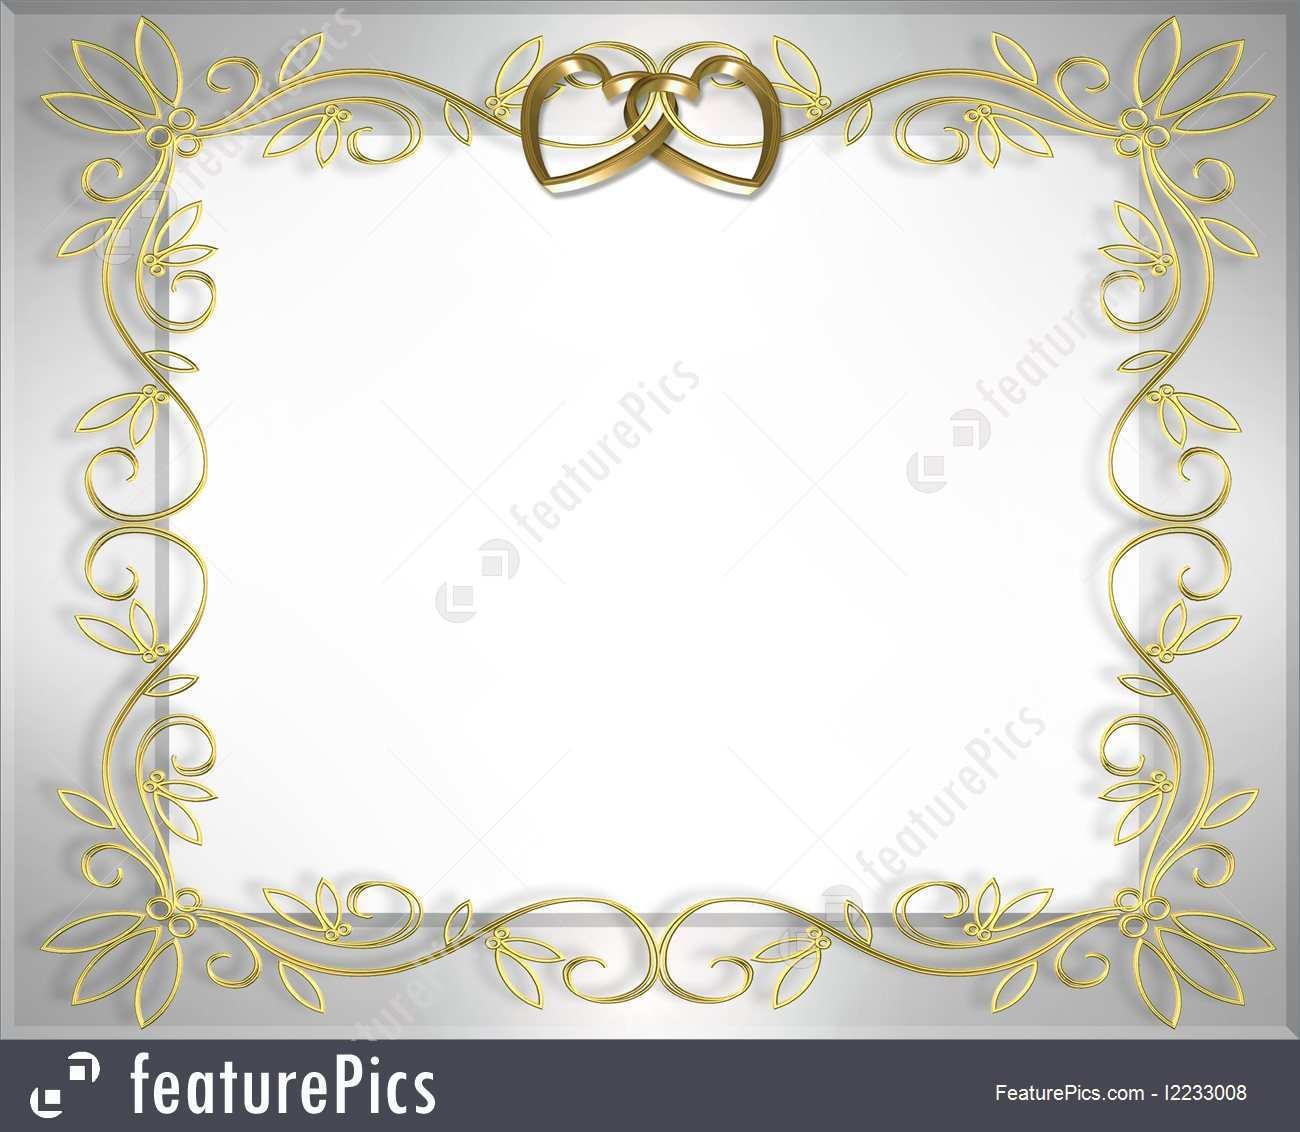 68 Customize Wedding Invitation Template Background in Word for Wedding Invitation Template Background